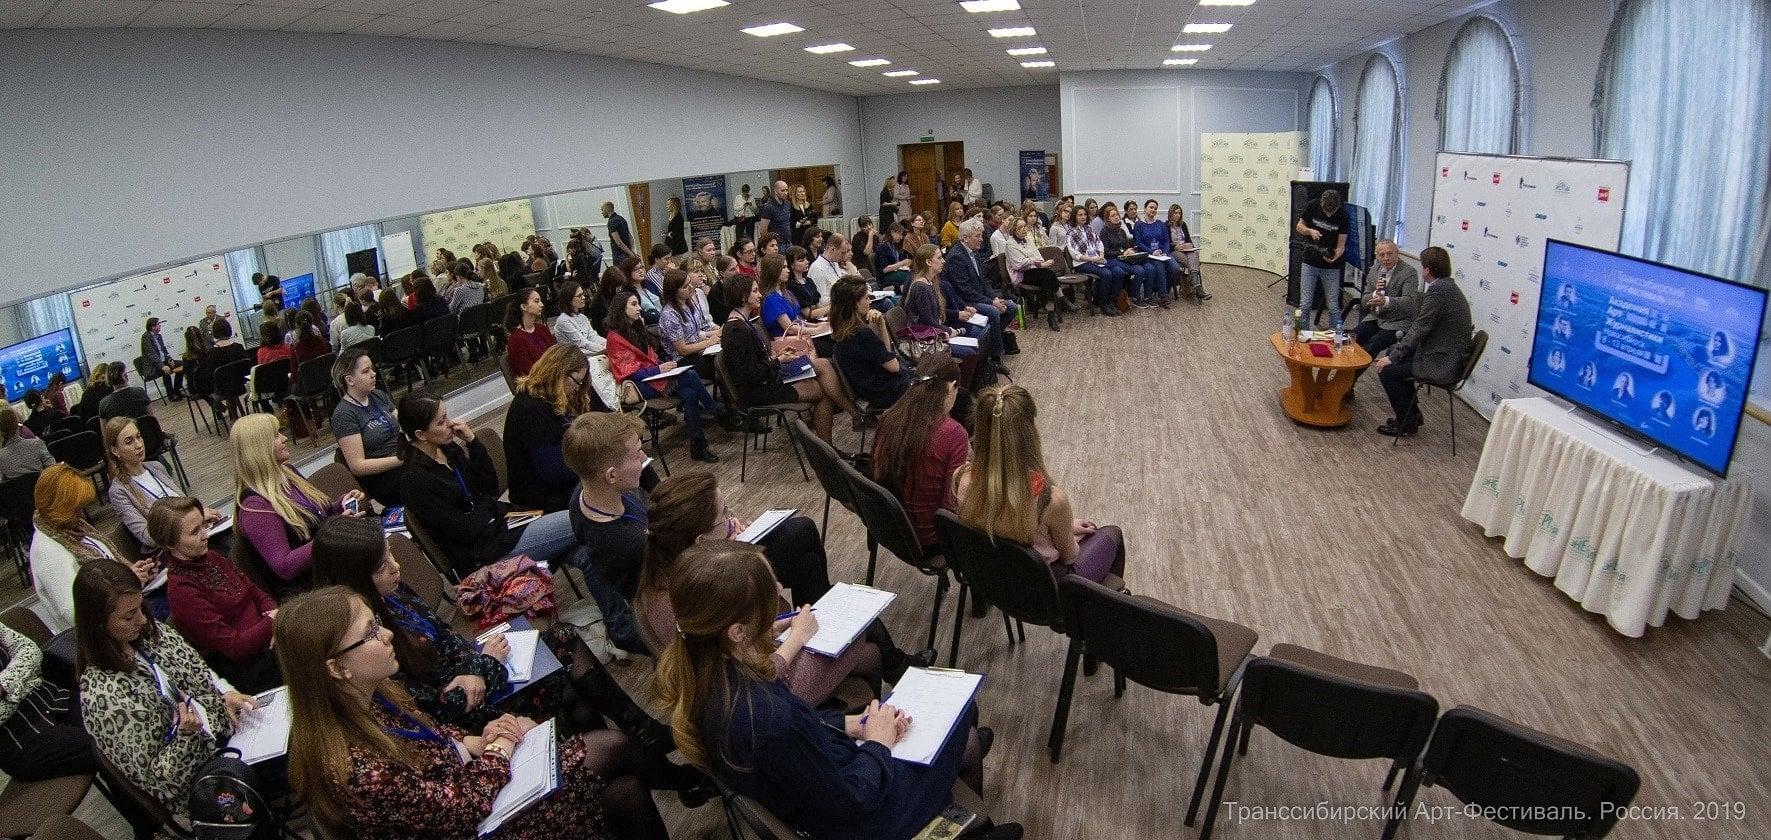 Академия арт-журналистики на Транссибирском арт-фестивале 2019. Фото - Александр Иванов